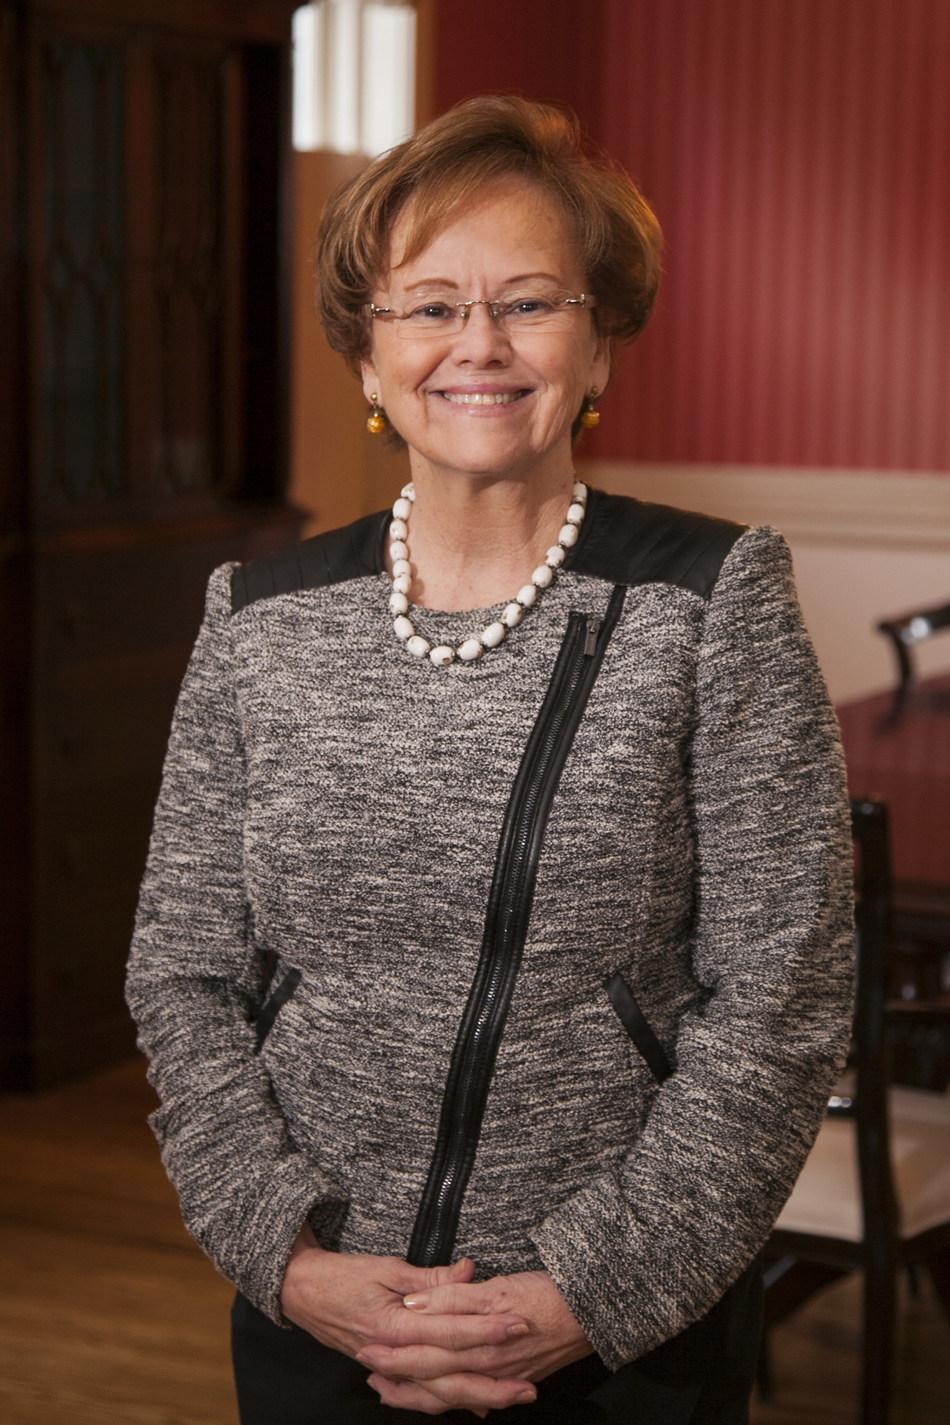 Dickinson College President, Margee Ensign (PRNewsfoto/Dickinson College)